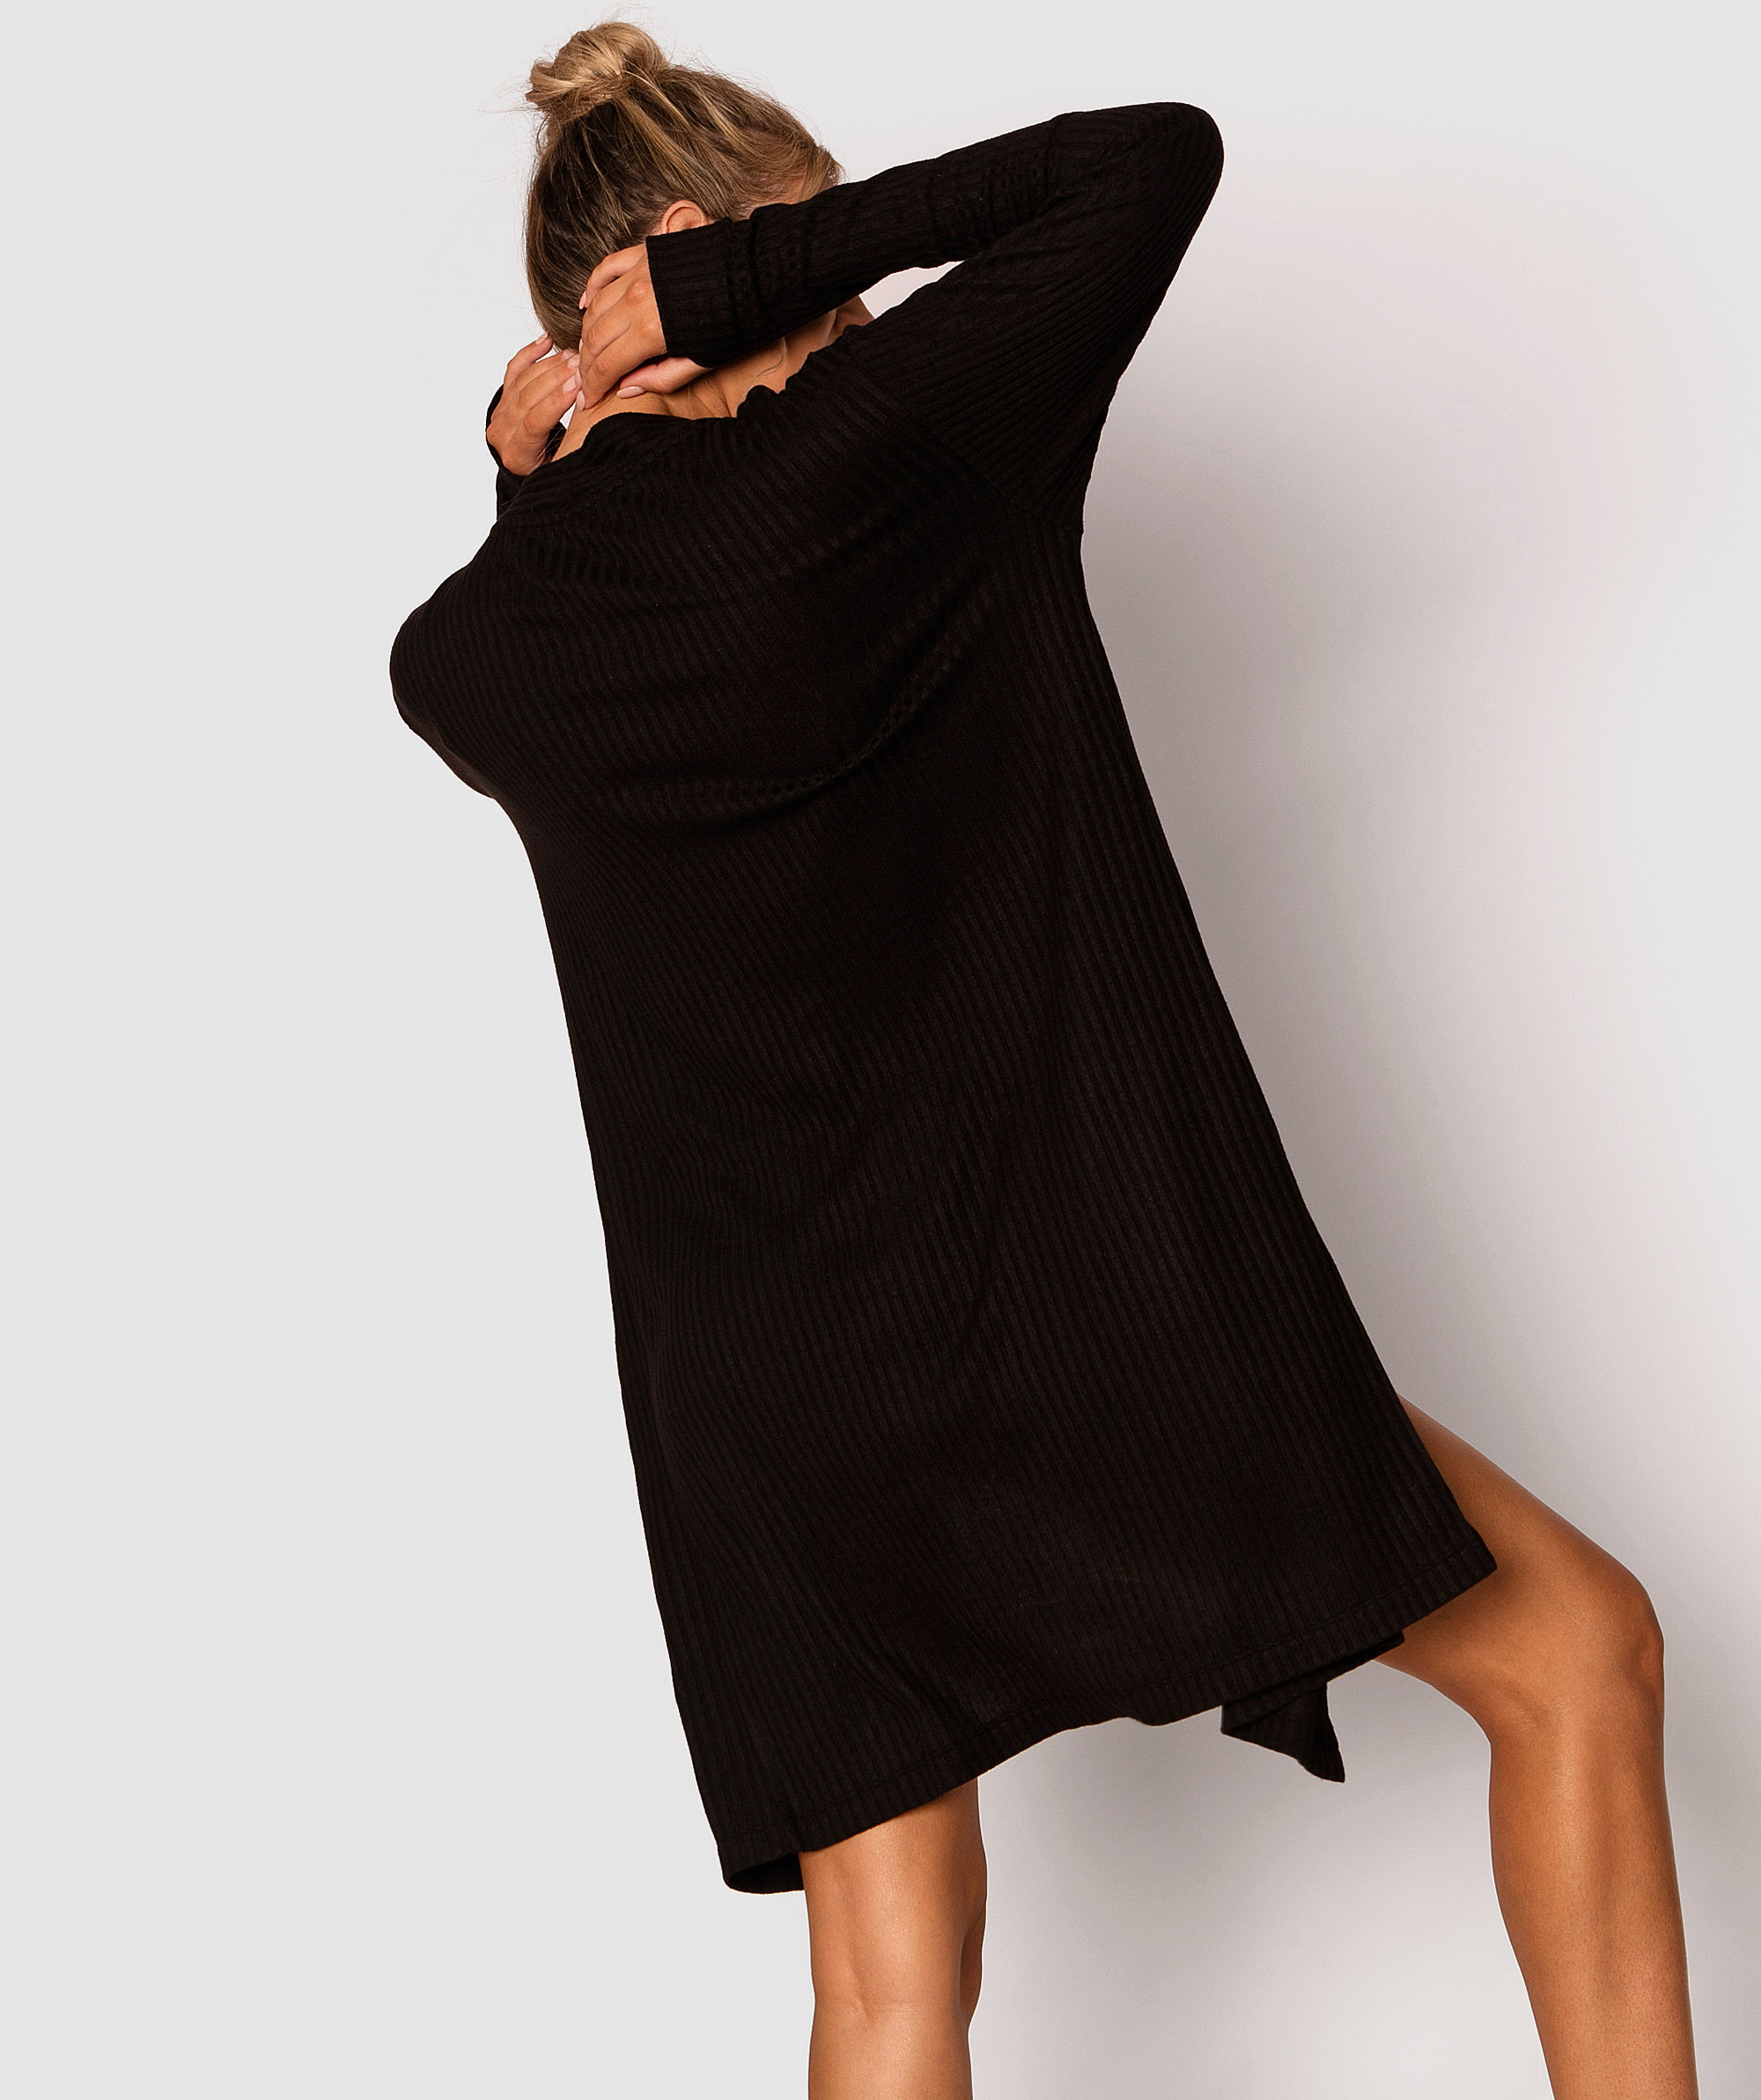 Style By Day Longline Cardigan - Black